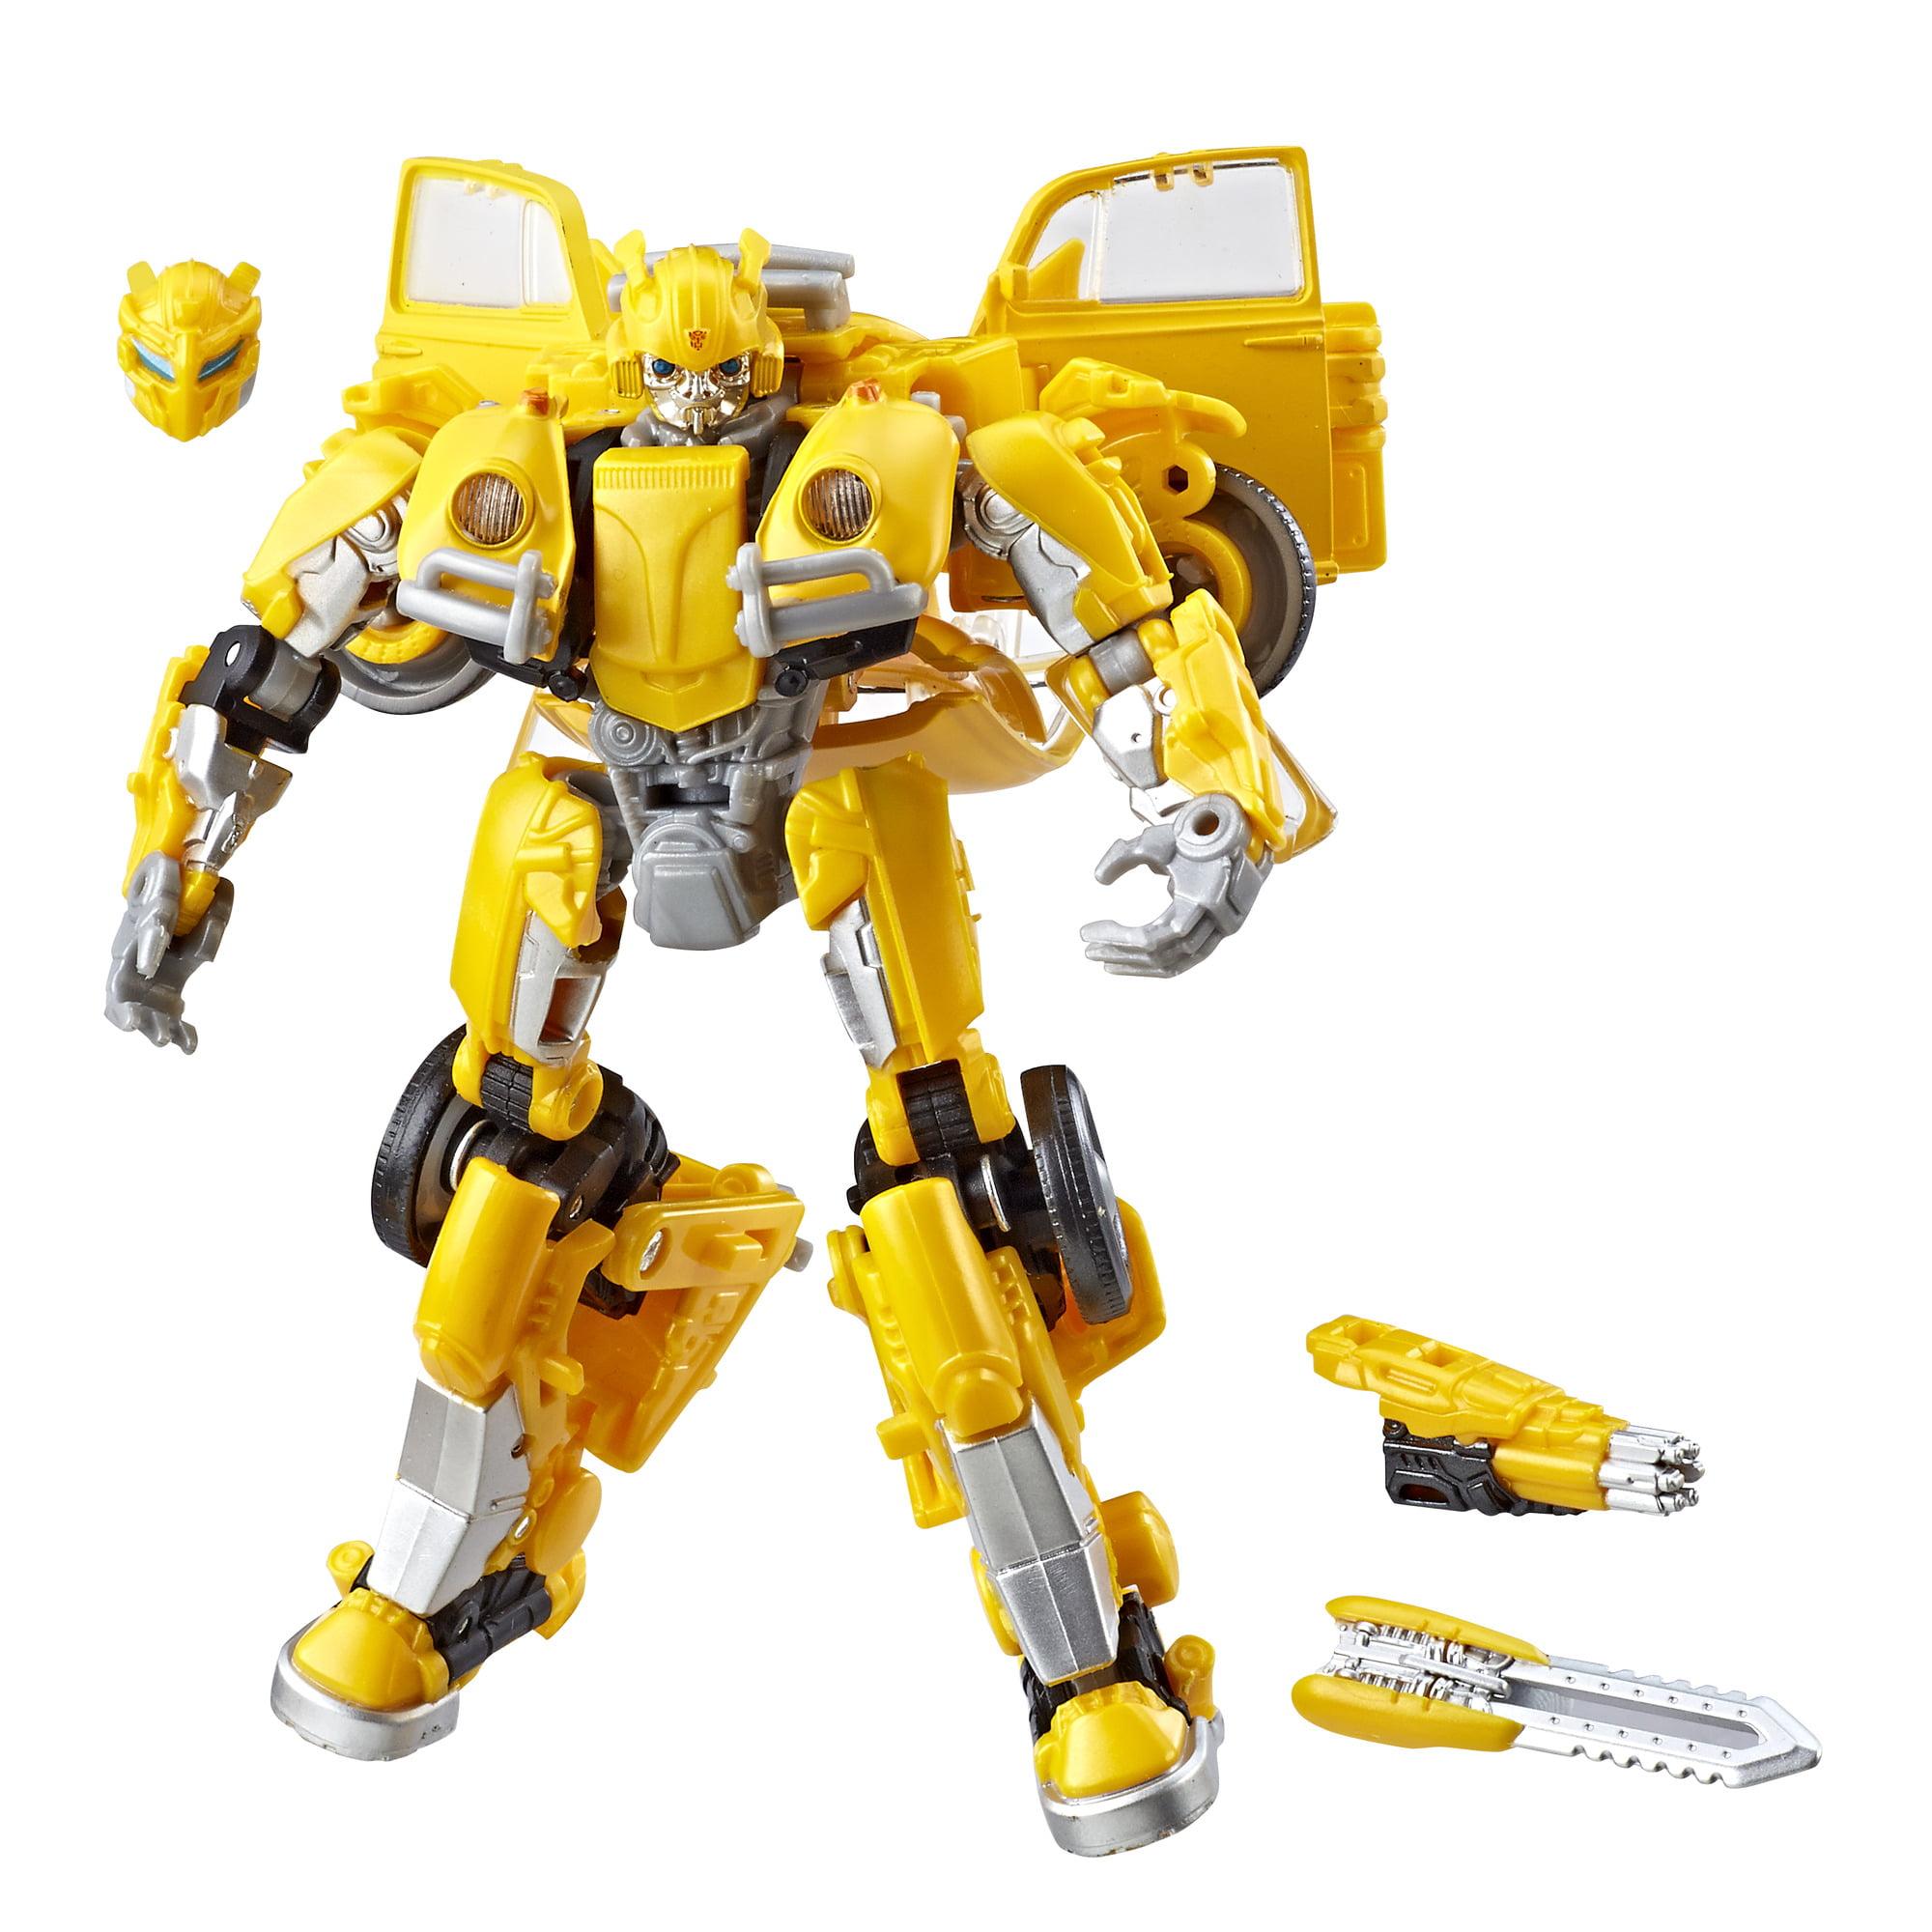 Transformers Studio Series 18 Deluxe Transformers: Bumblebee -- Bumblebee by Hasbro Inc.